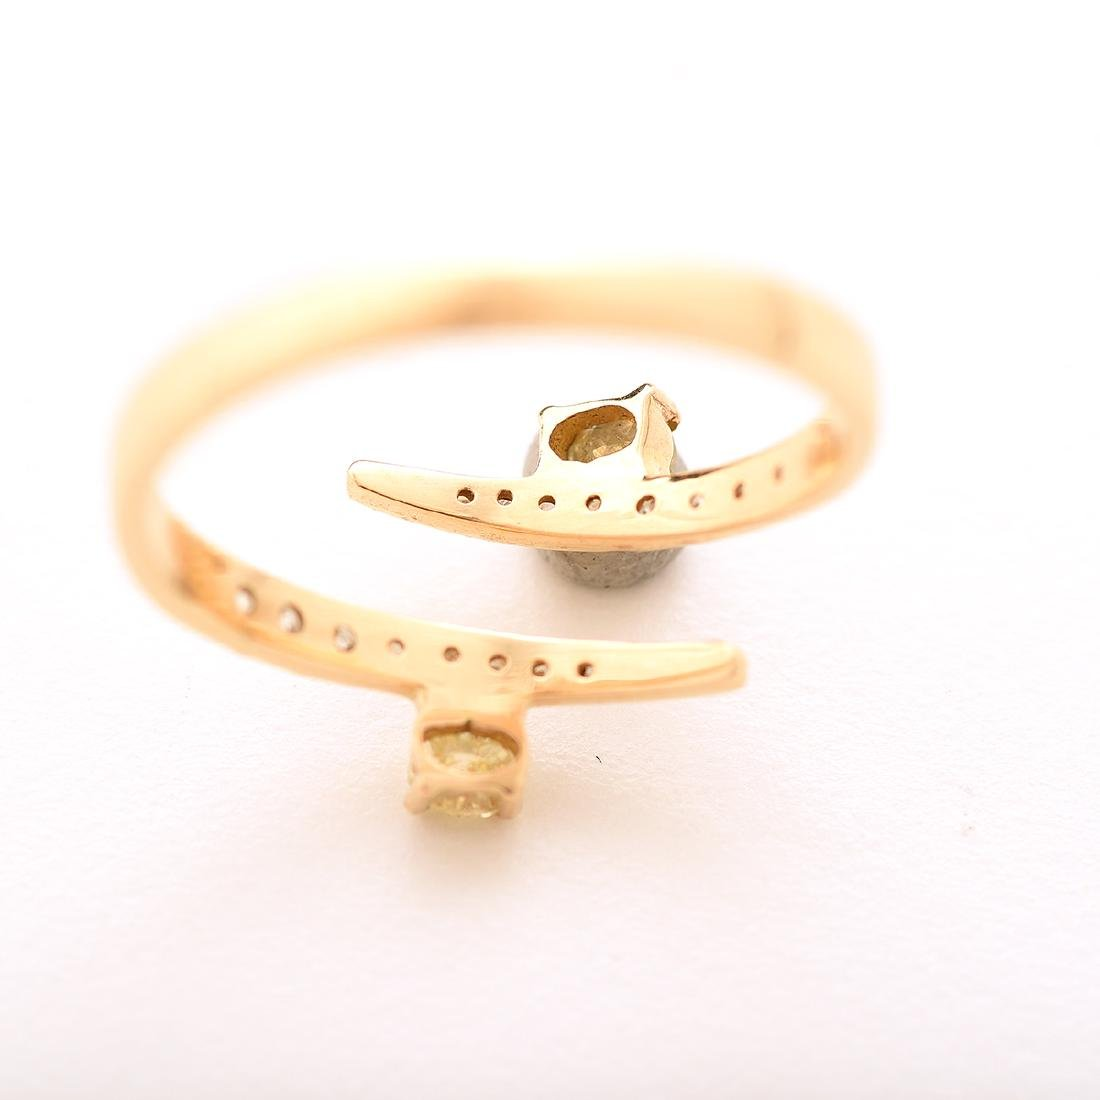 Diamond, 18k Yellow Gold Bypass Ring. - 4